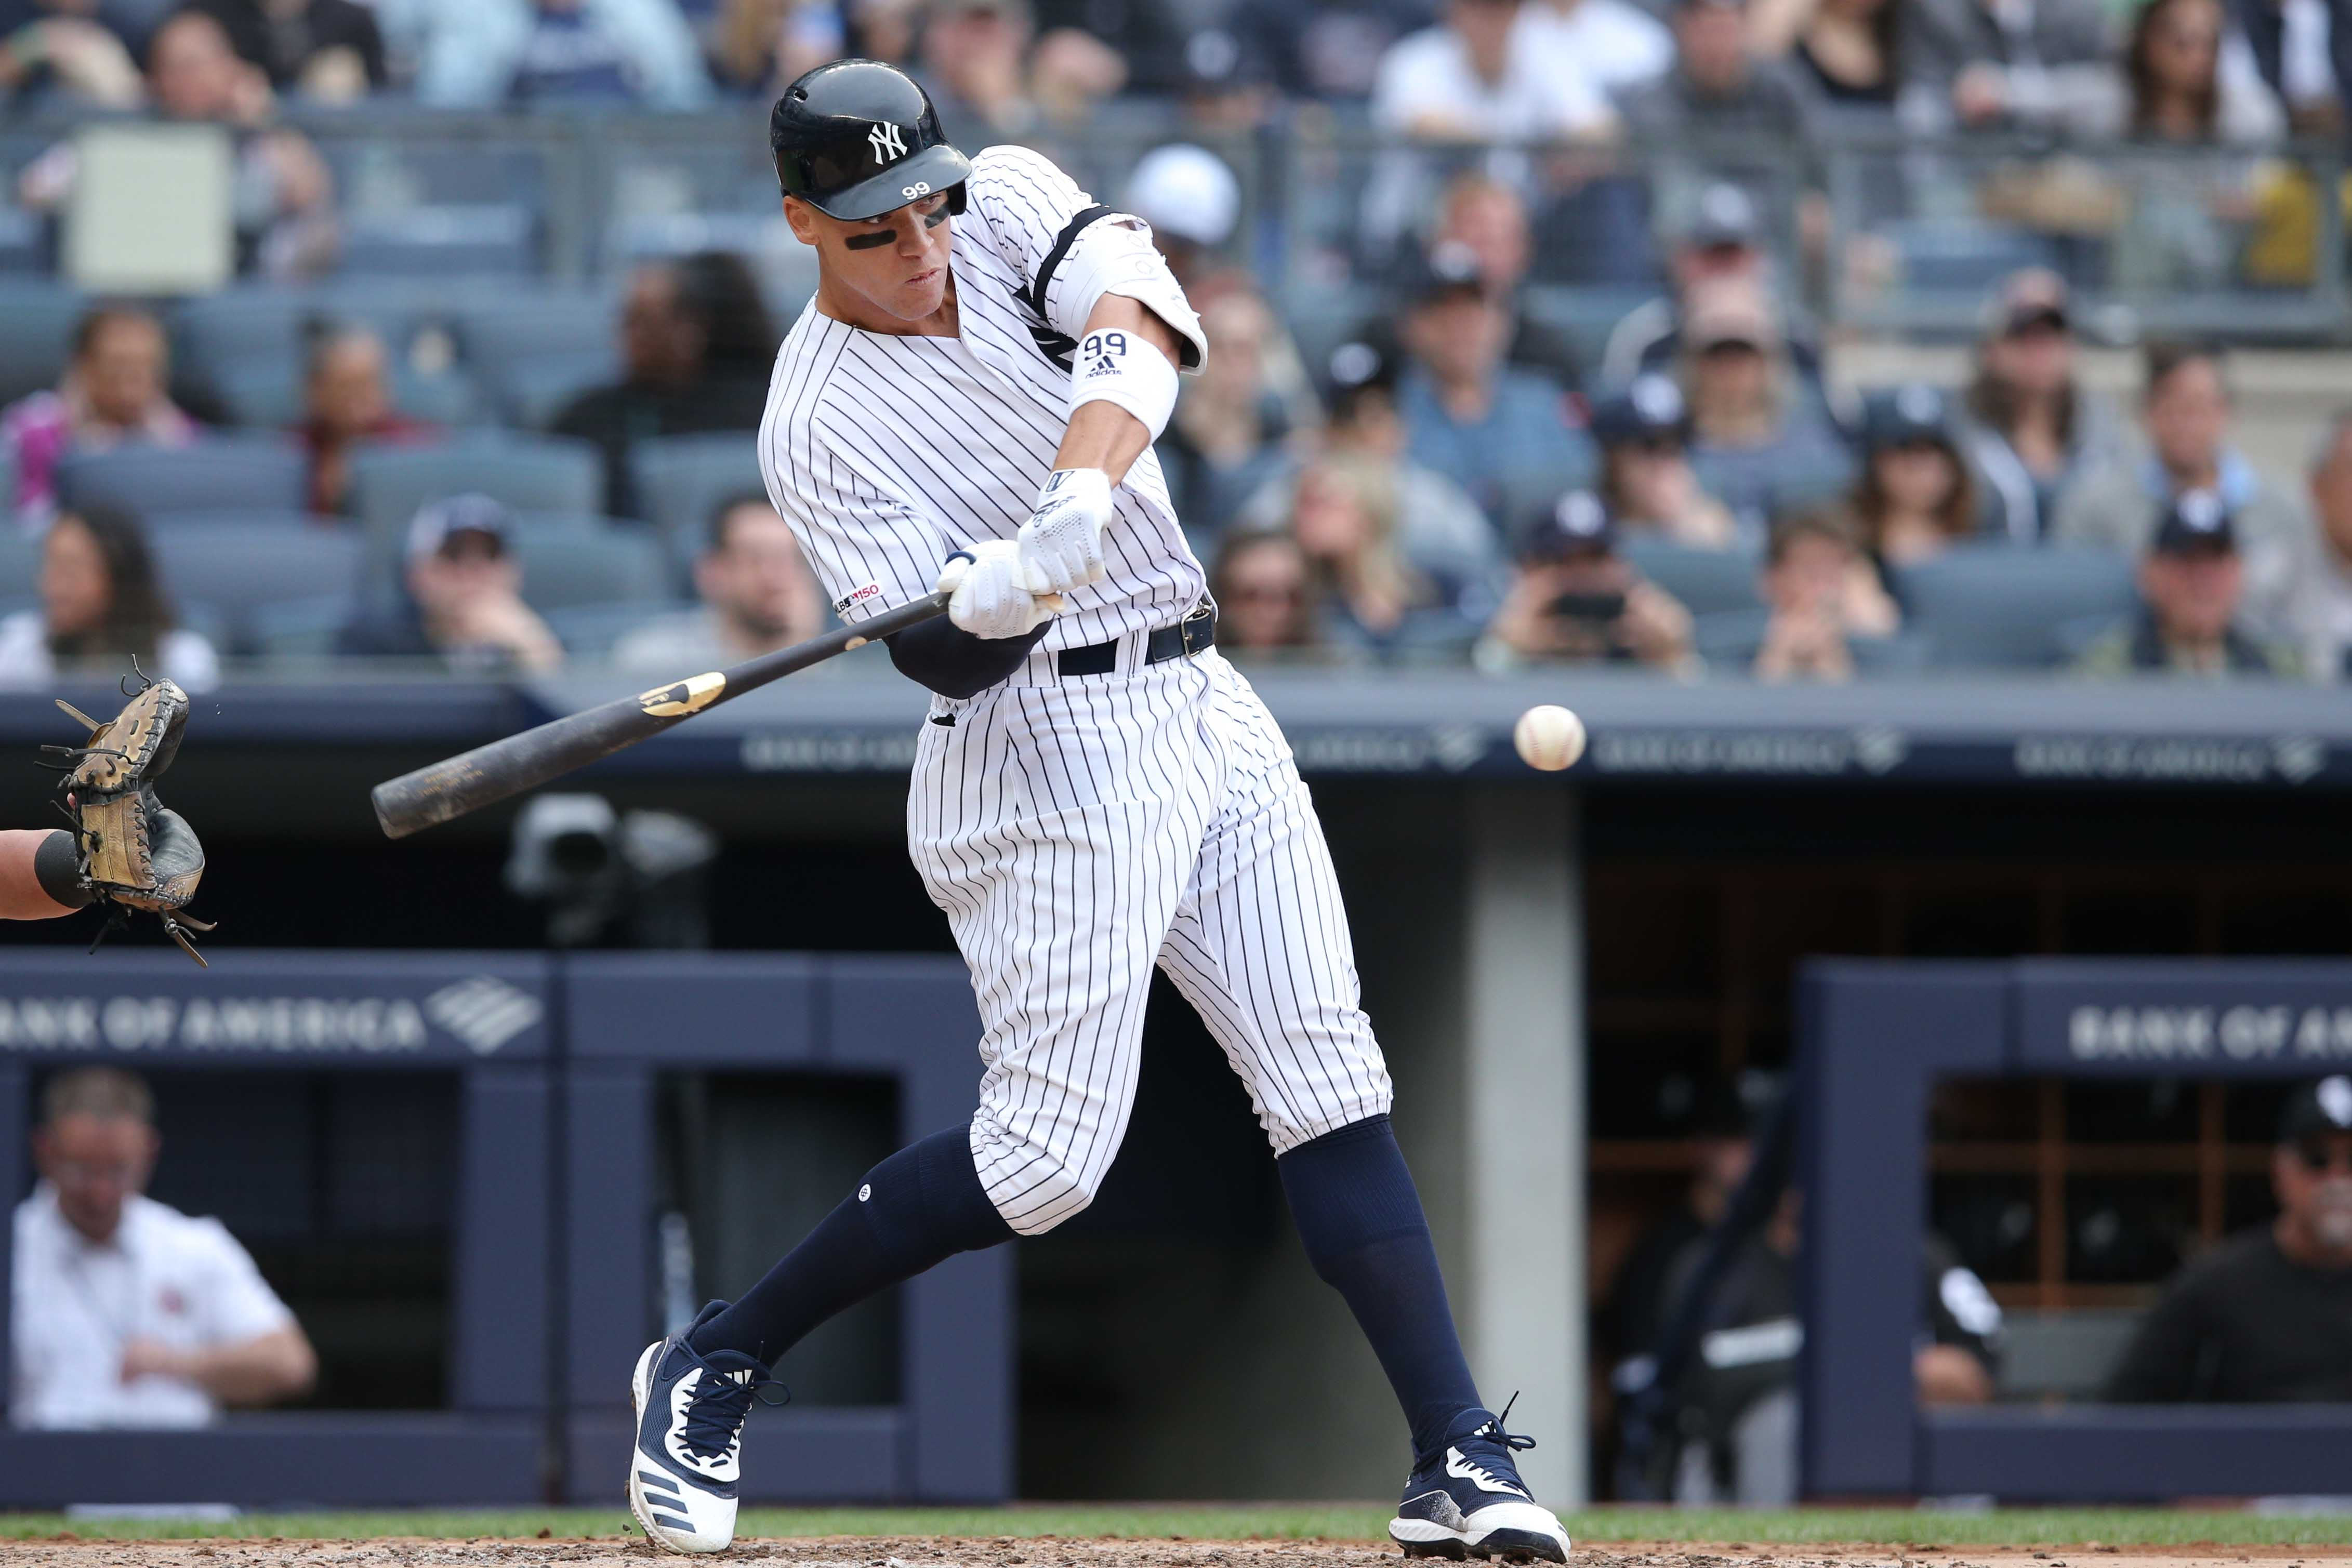 Yankees place CC Sabathia on the injured list